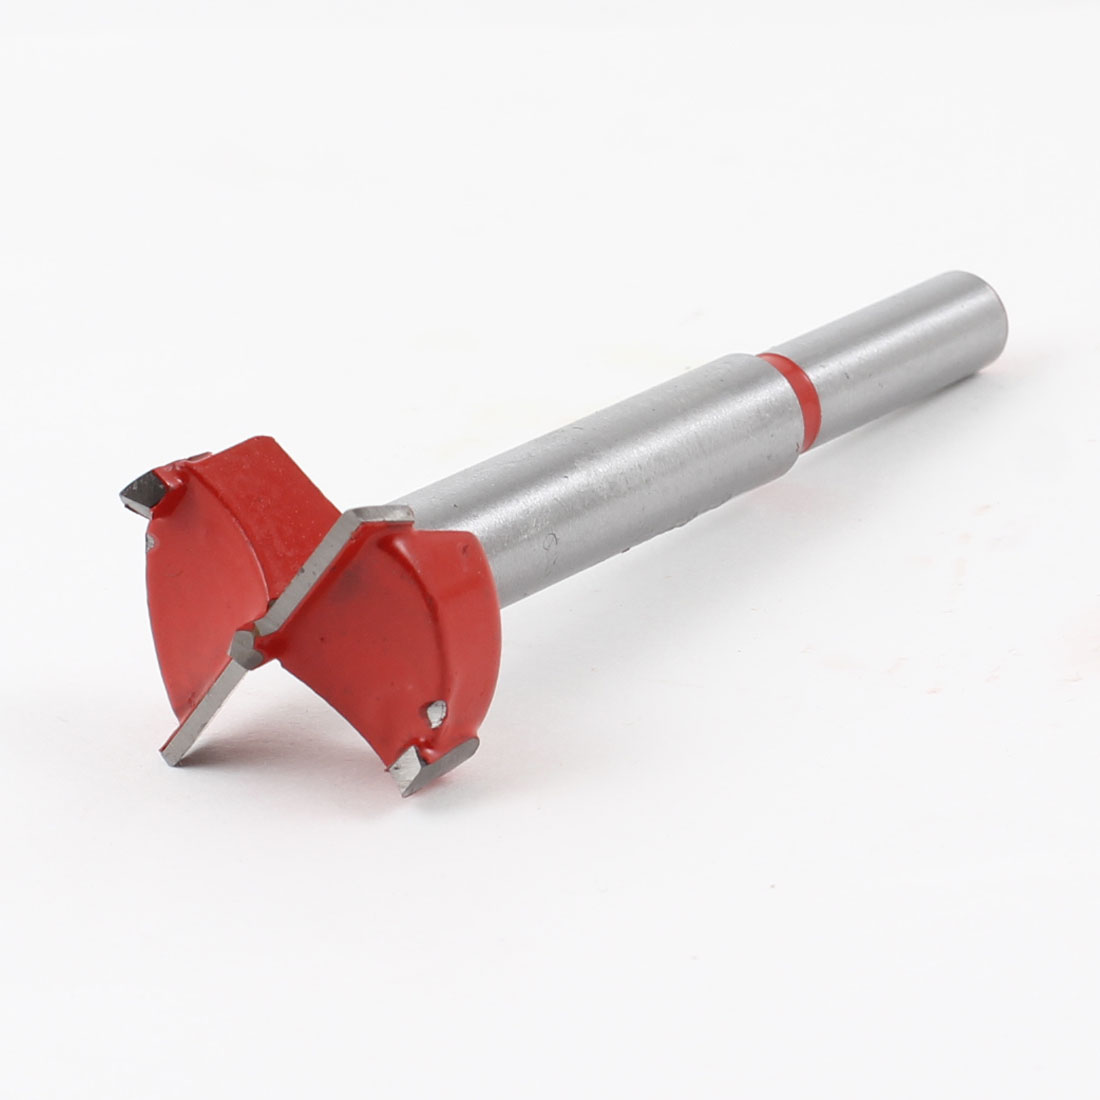 Carpenters Carbide Tipped 25mm Diameter Hinge Boring Bit Red Silver Tone